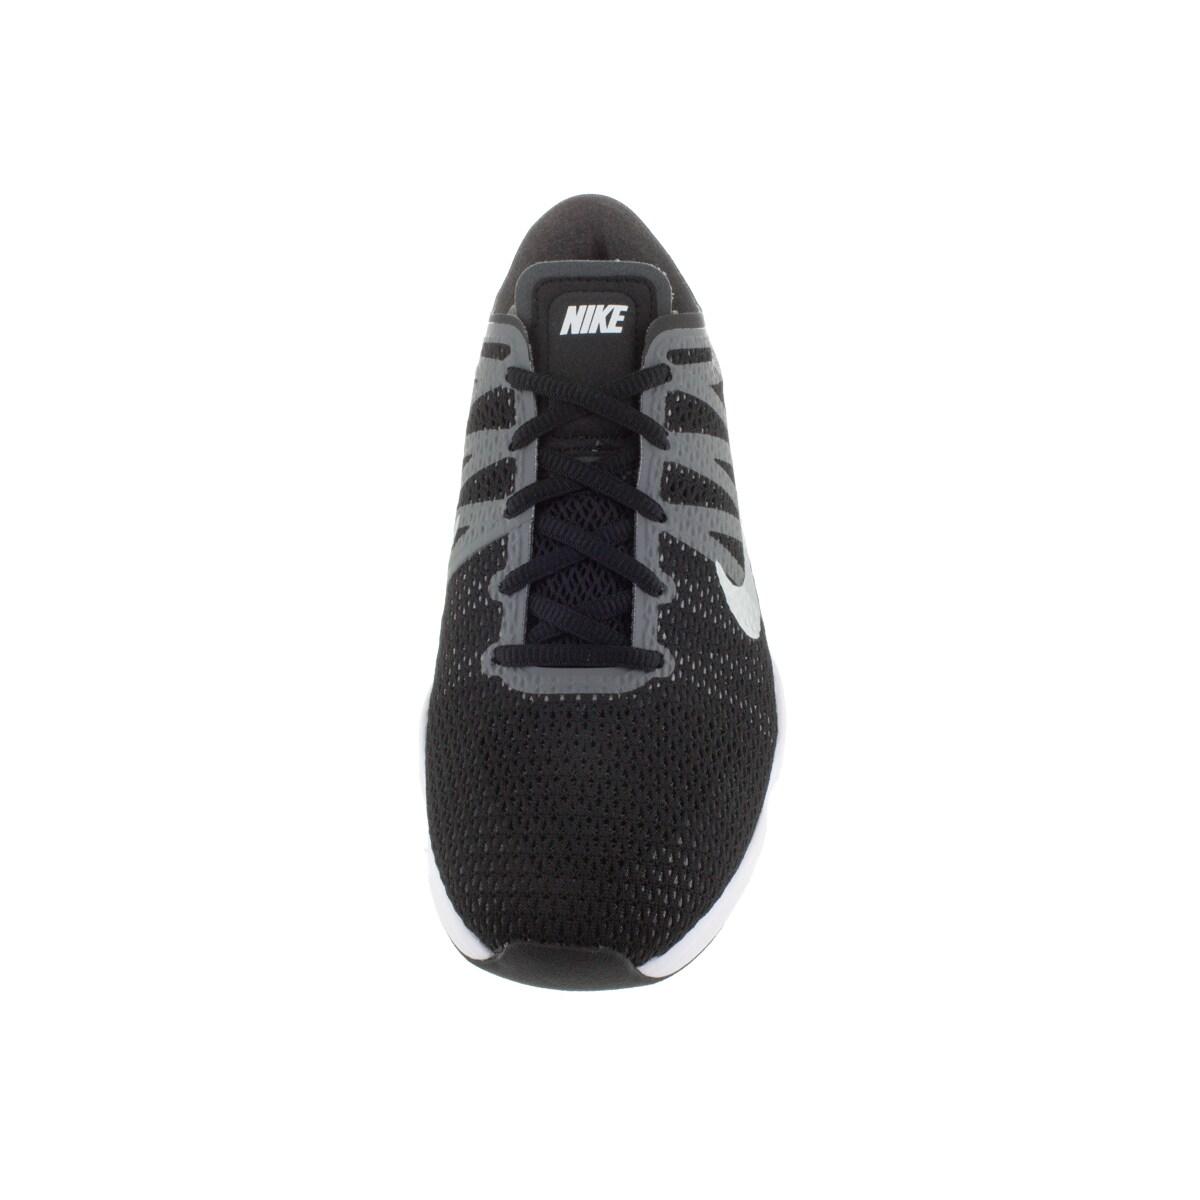 ff8c56be8b4b Shop Nike Women s Air Zoom Fit 2 Black White Dark Grey Grey Training Shoe -  Free Shipping Today - Overstock - 12329287